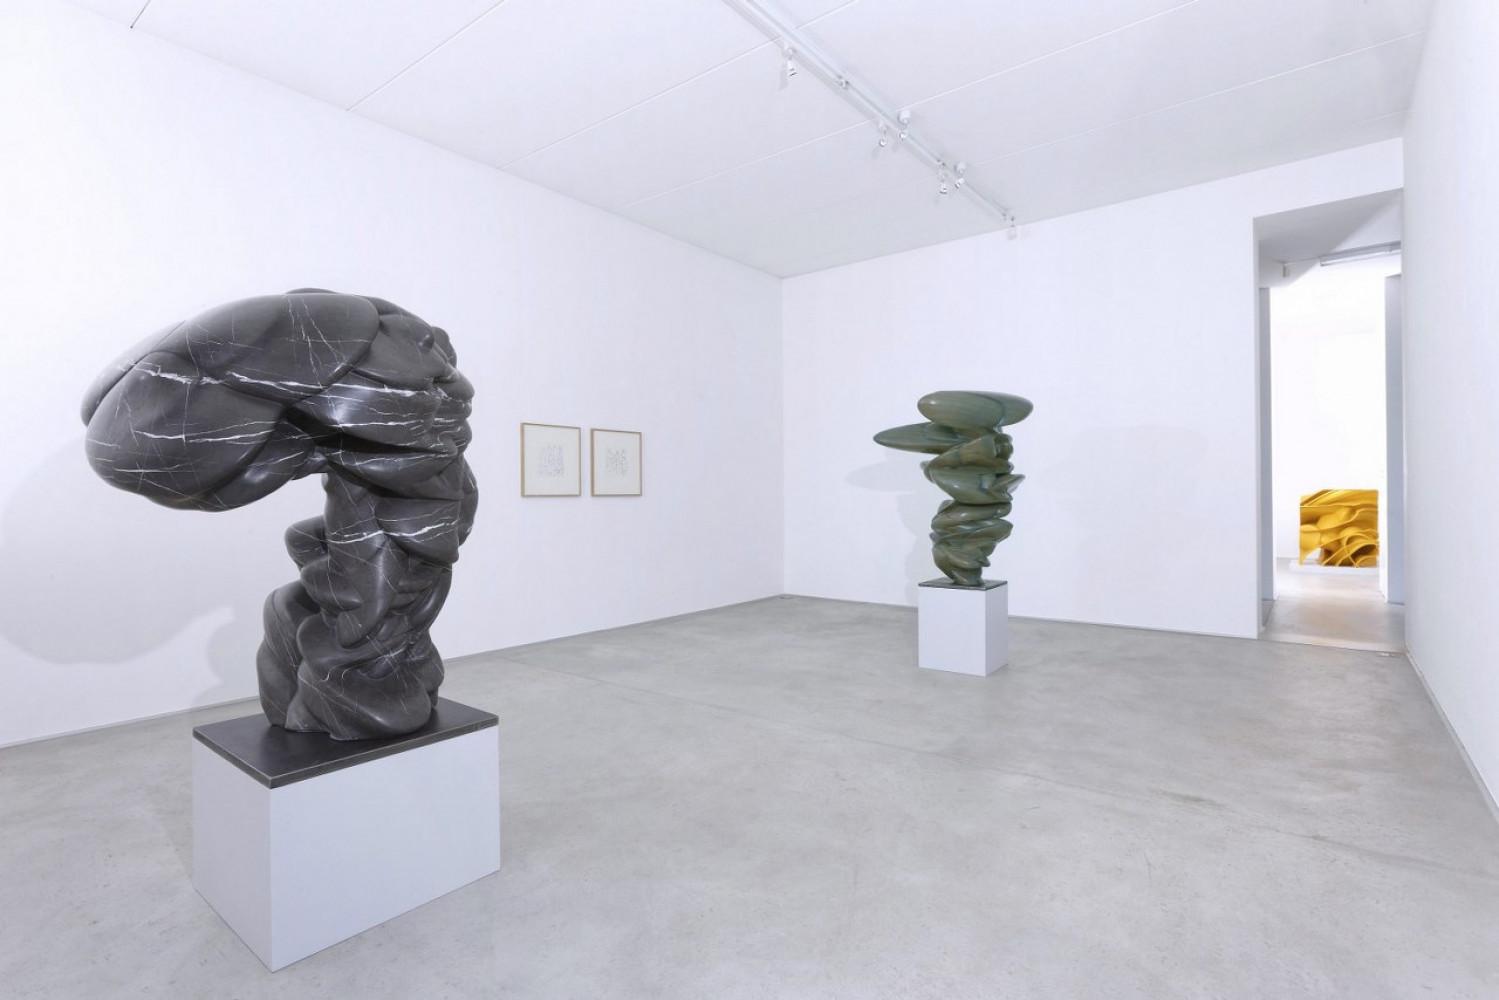 Tony Cragg, 'Sculture', Installation view, 2015